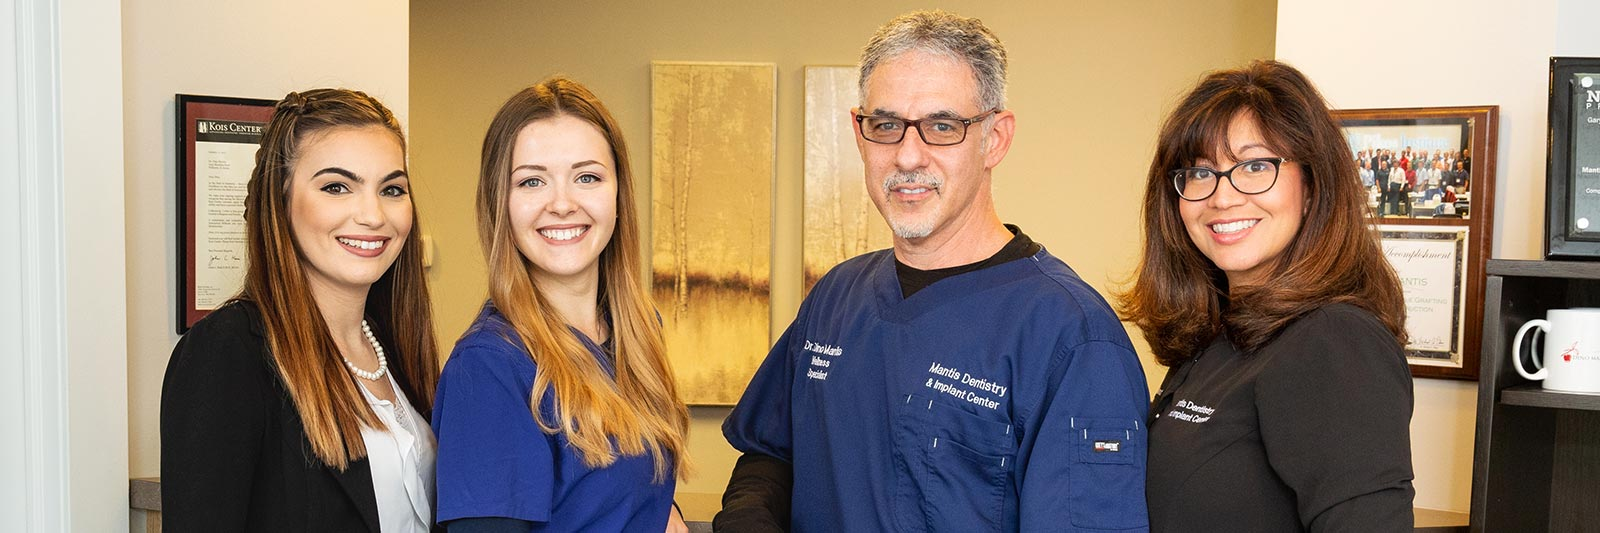 Orthodontist & Dentist in Wilmette IL 60091 - Wilmette